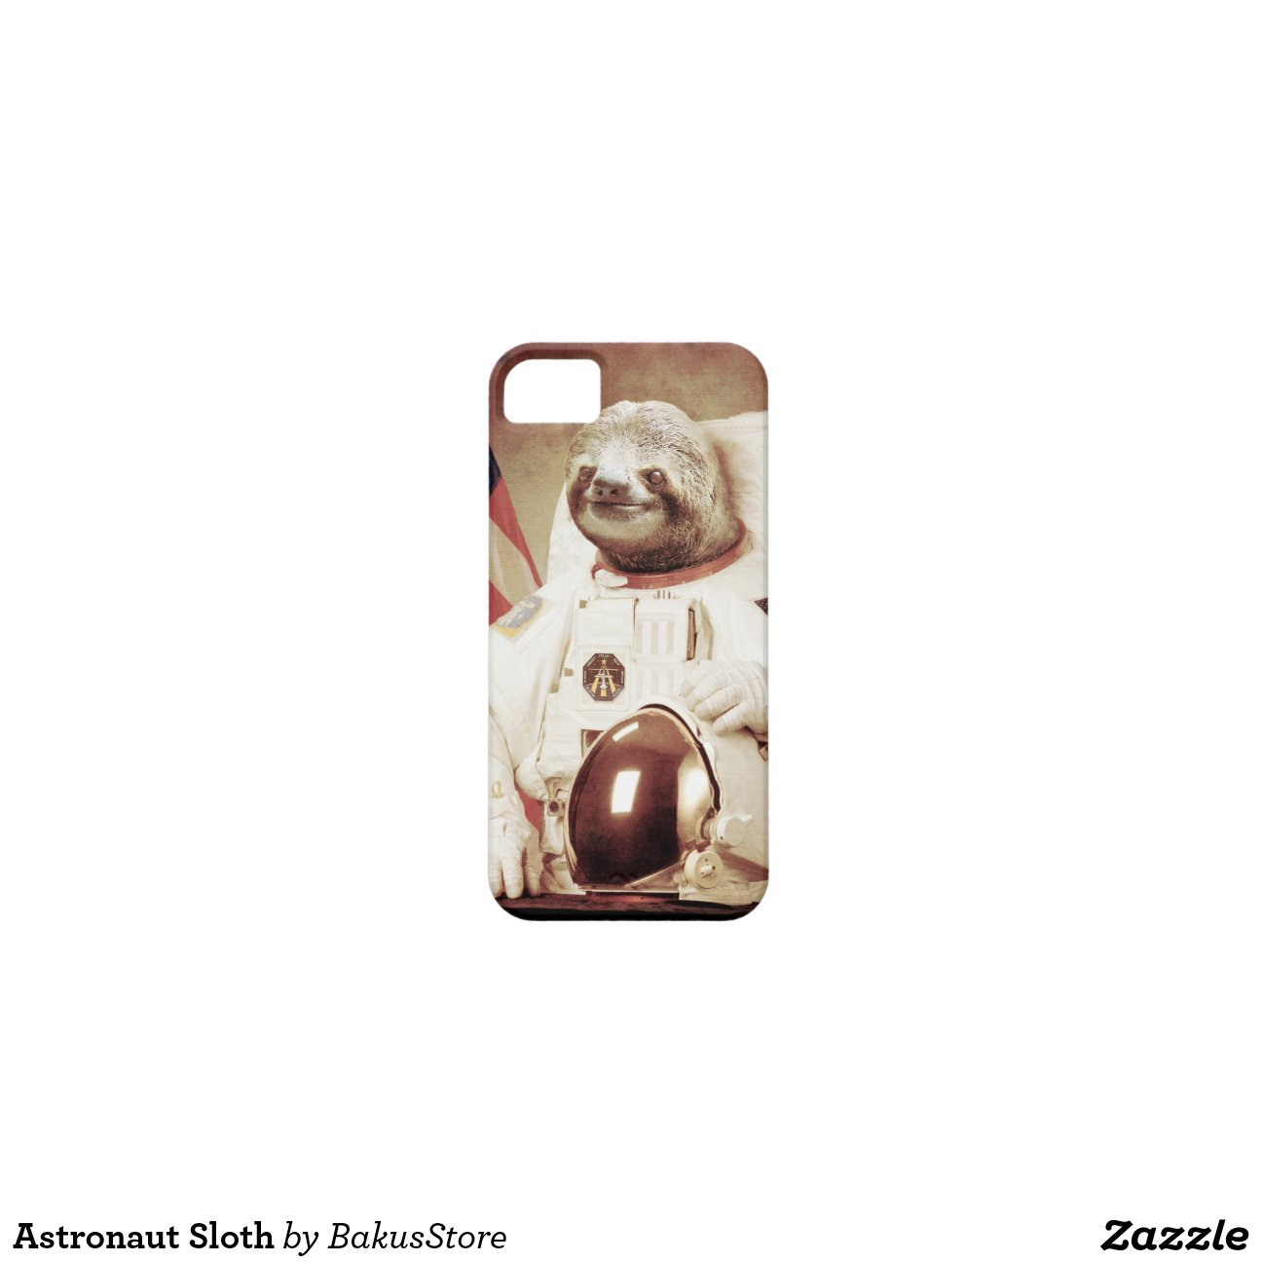 sloth astronaut facebook cover - photo #4